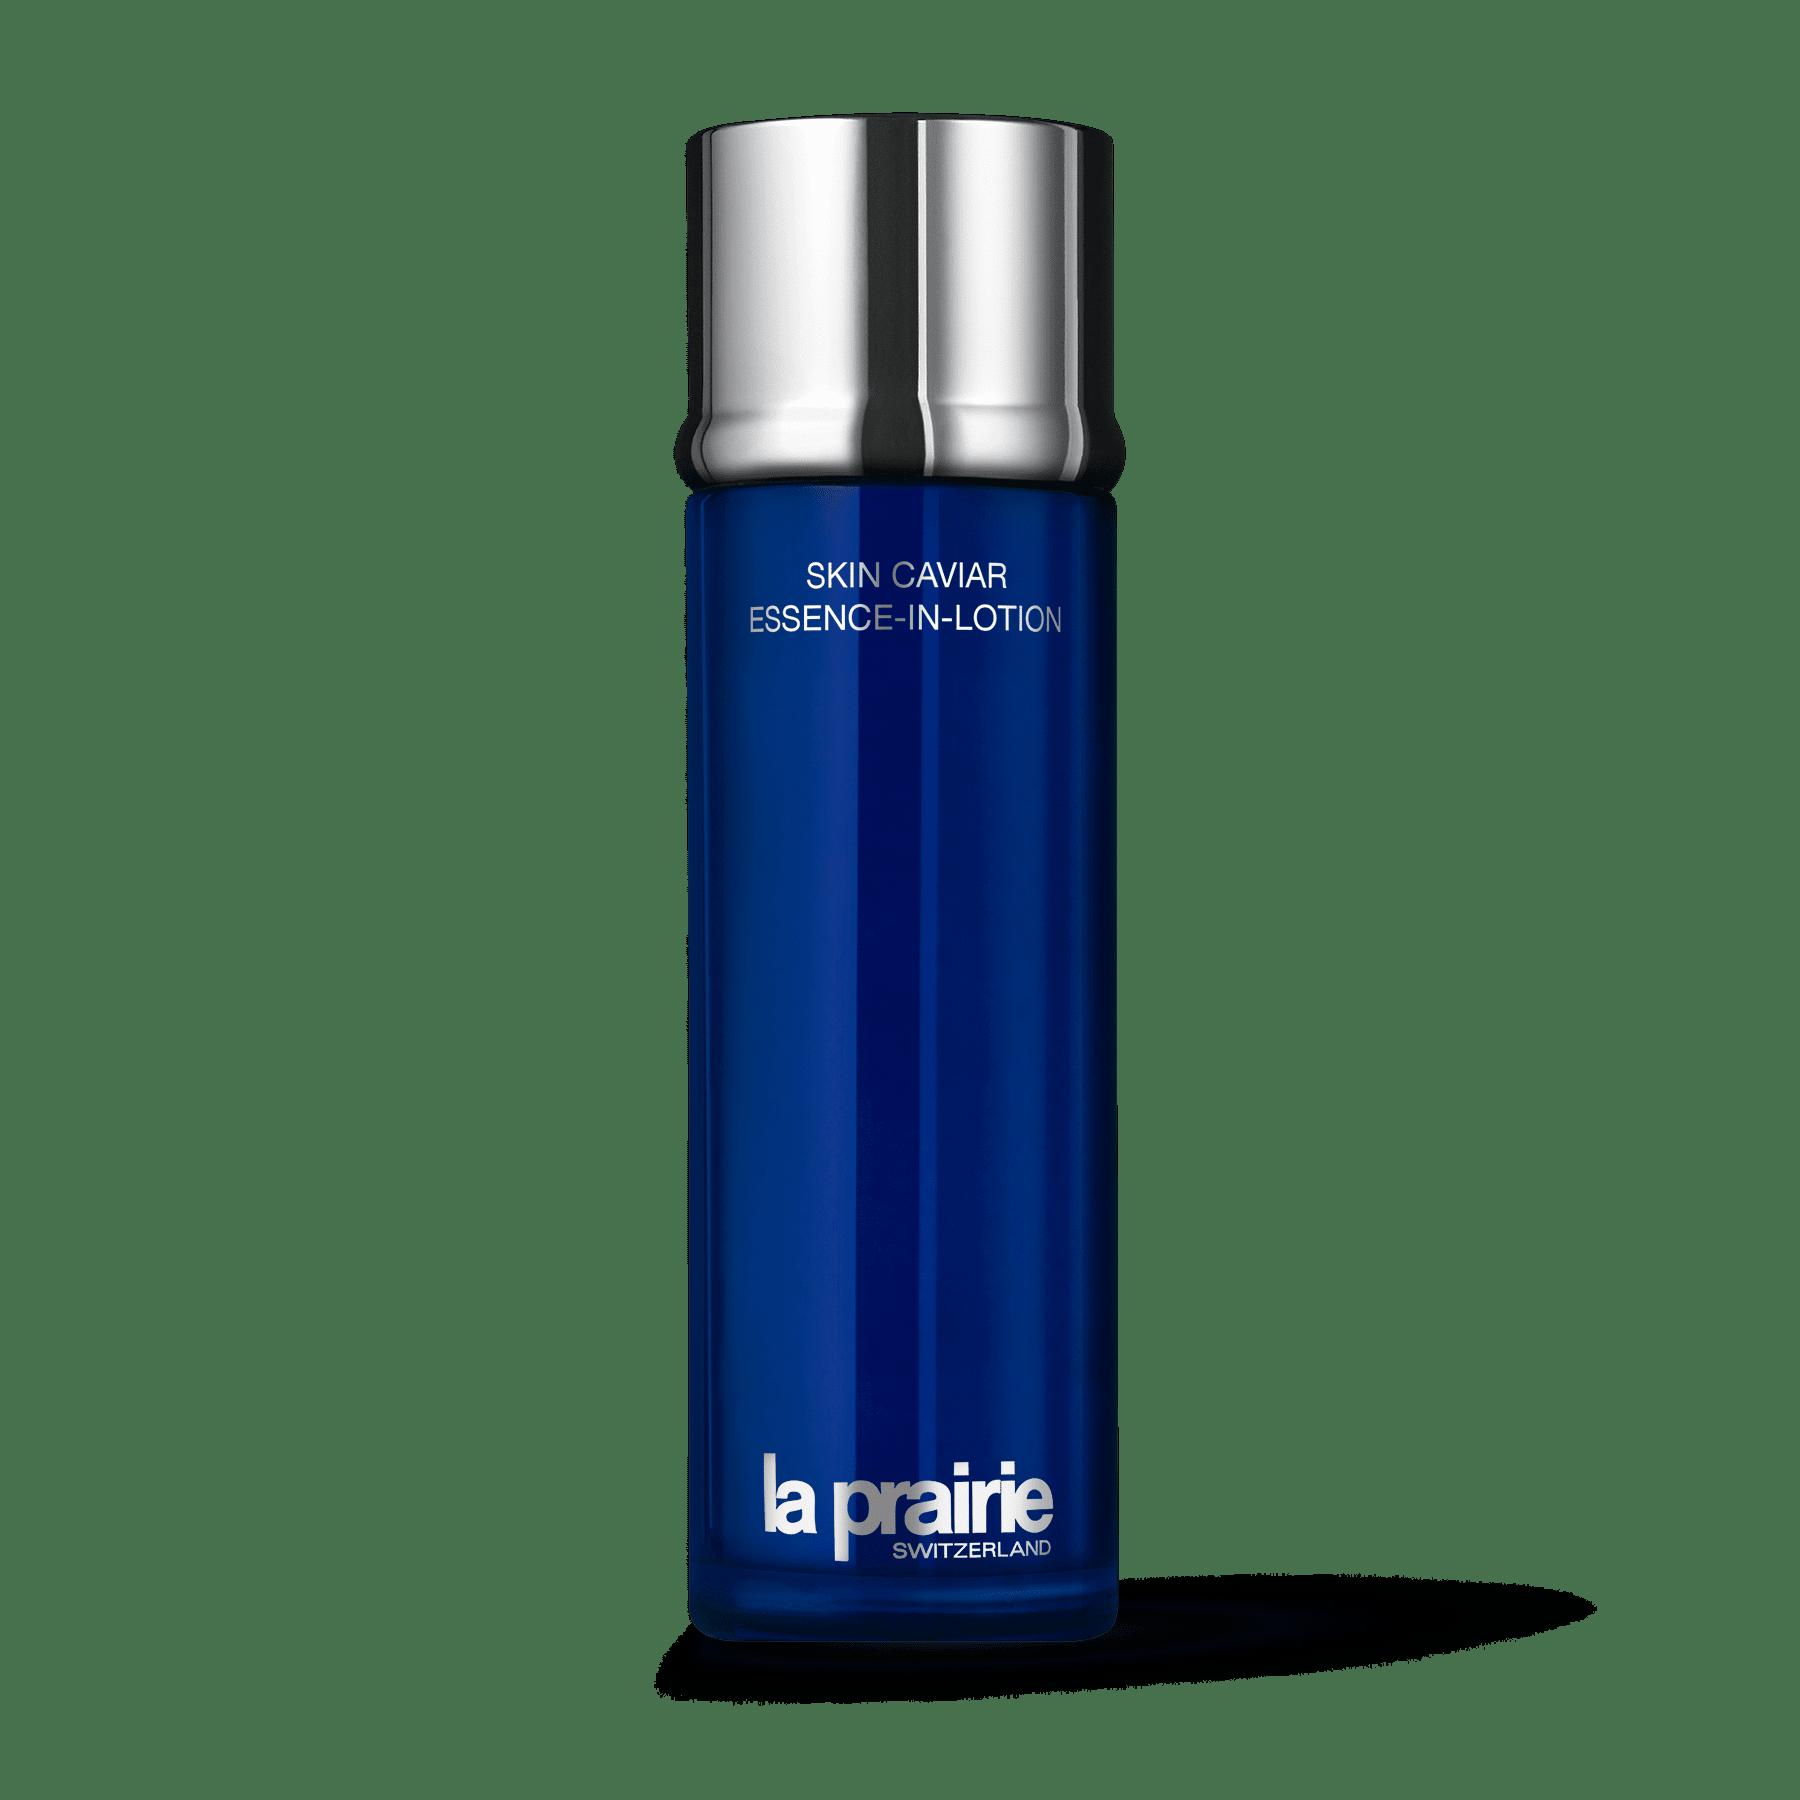 La prairie skin caviar essence in lotion